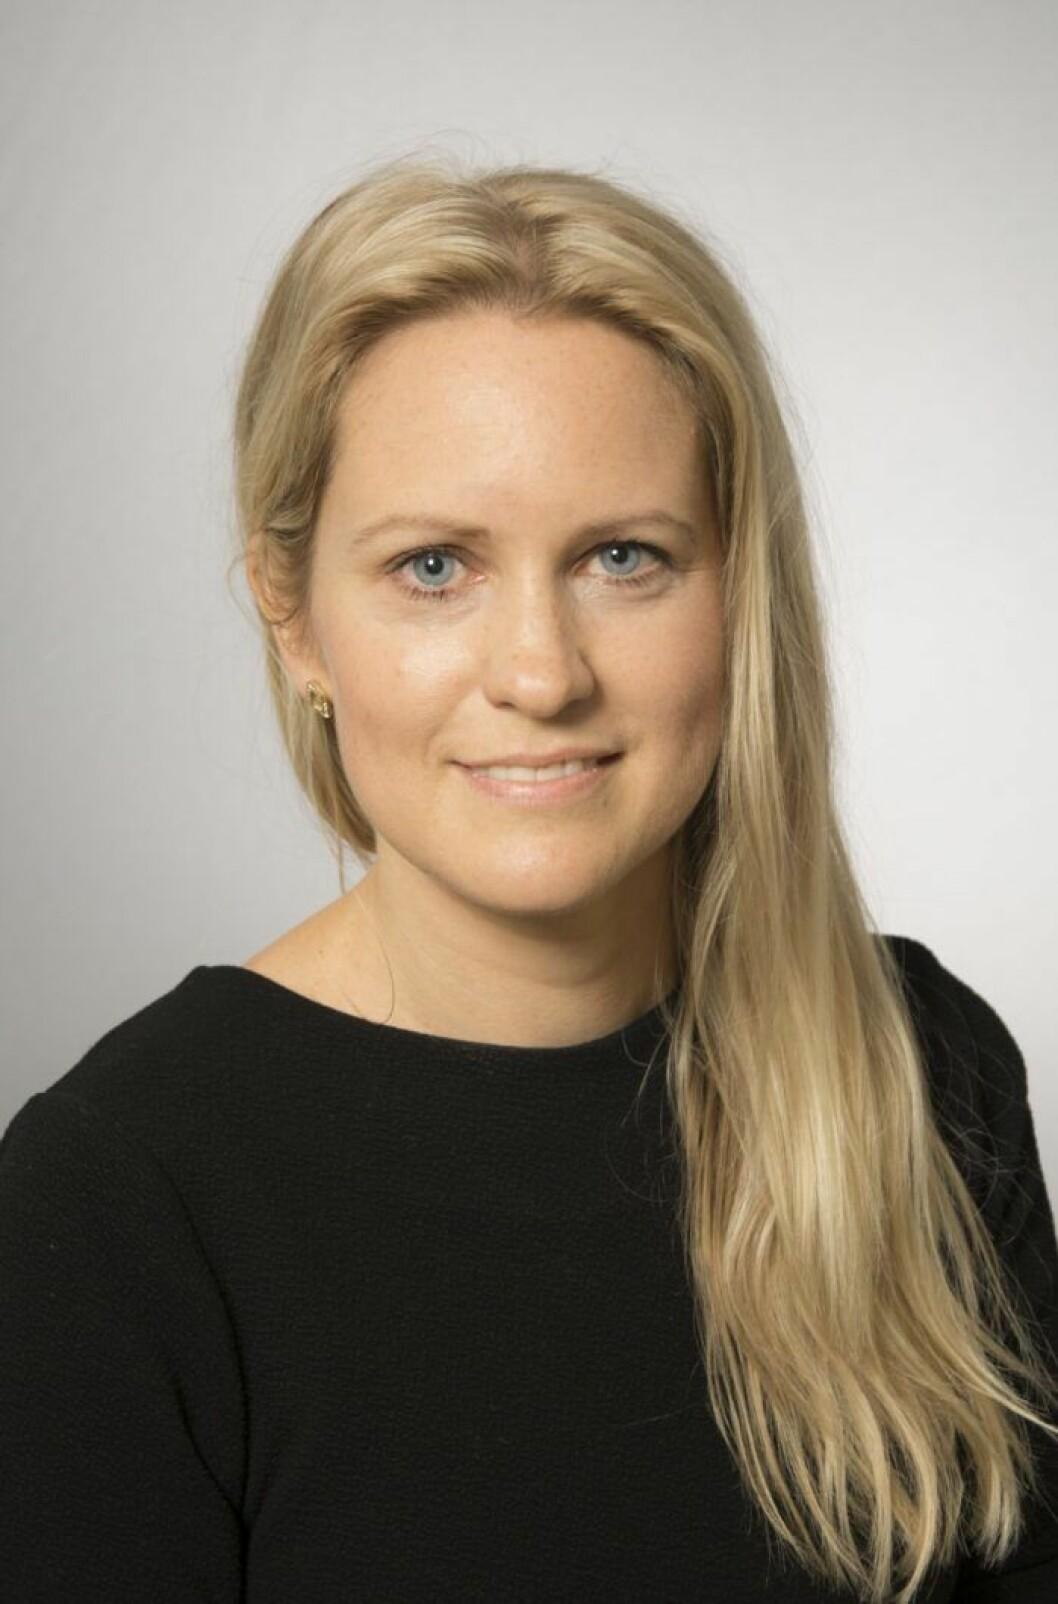 Docent i psykologi Kristina Holmqvist Gattario